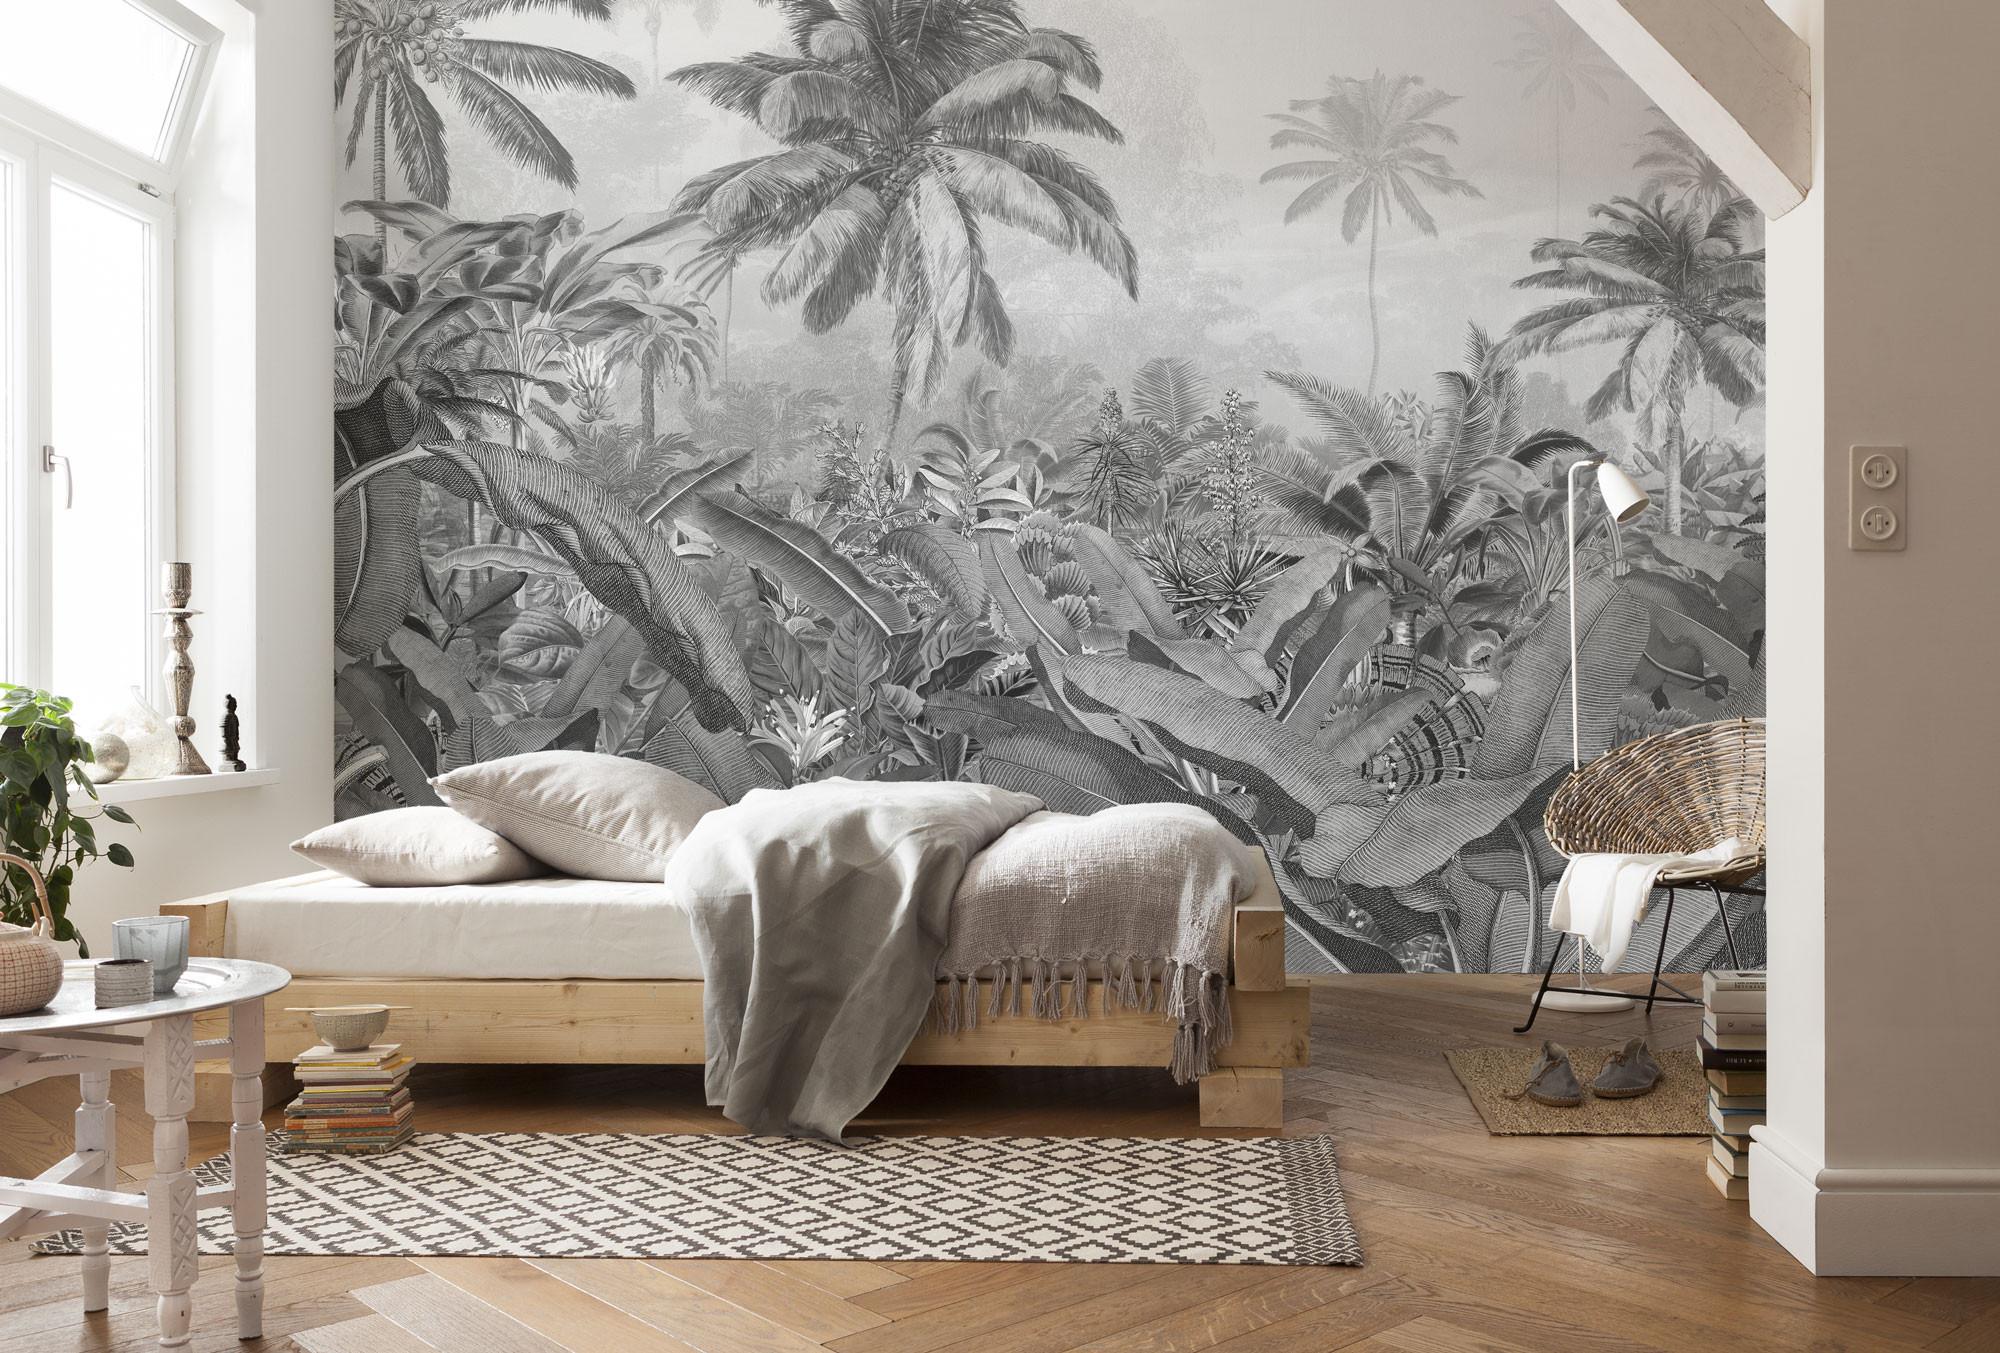 Amazonia Black and White